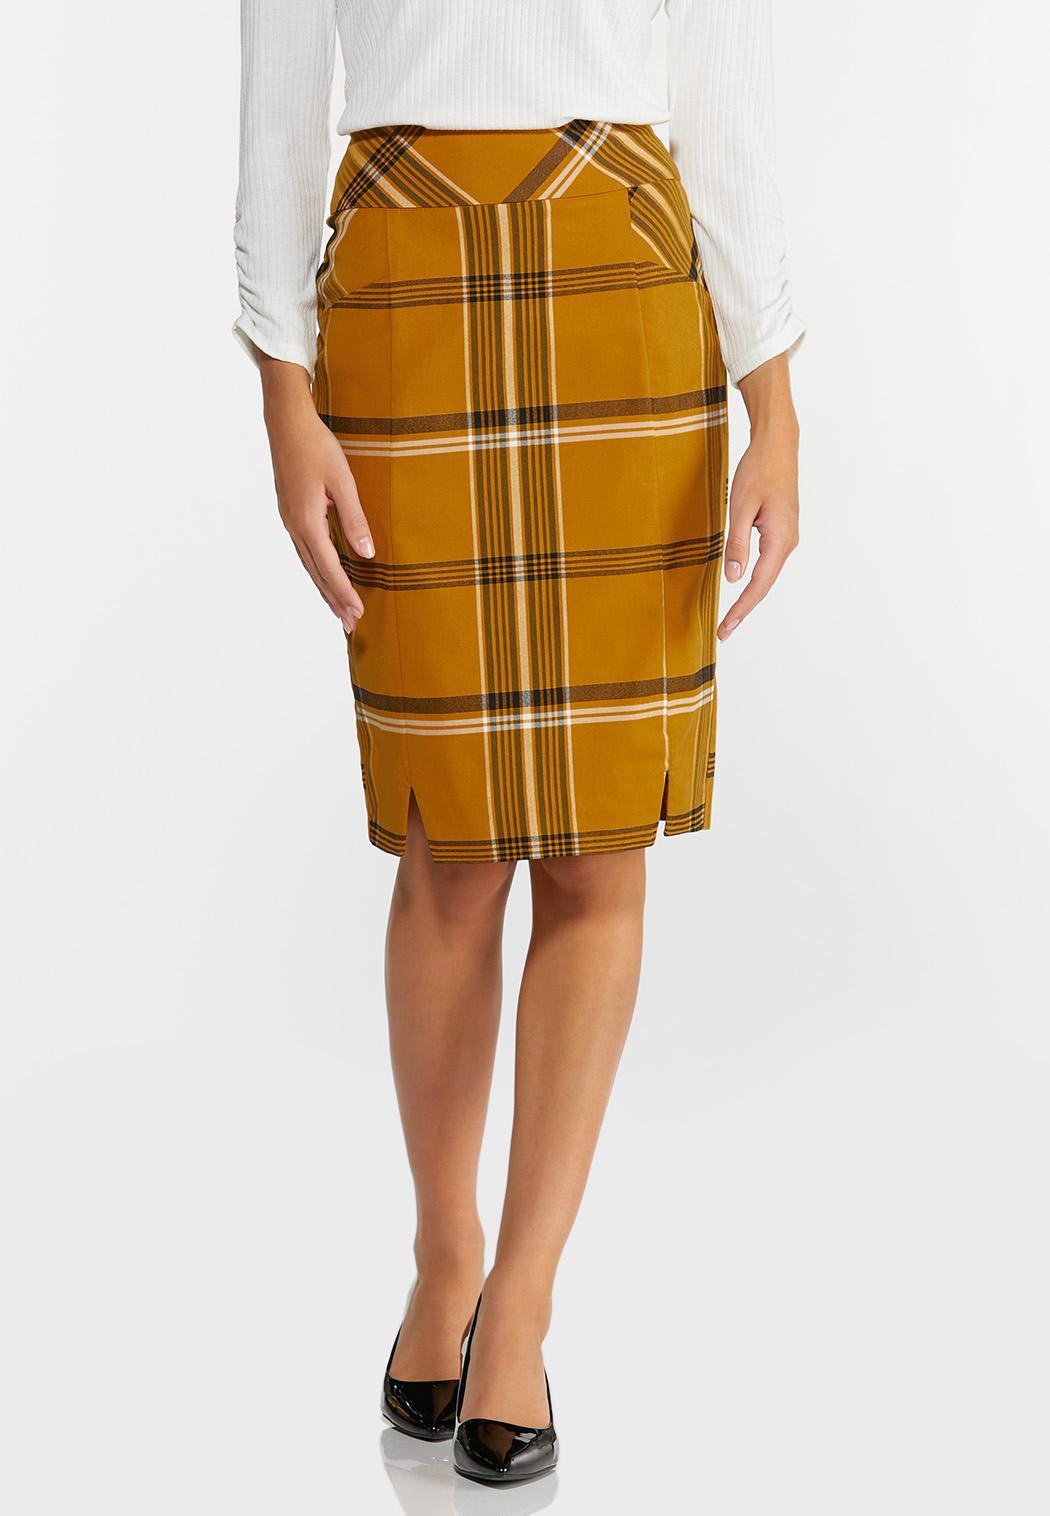 Gold Plaid Pencil Skirt